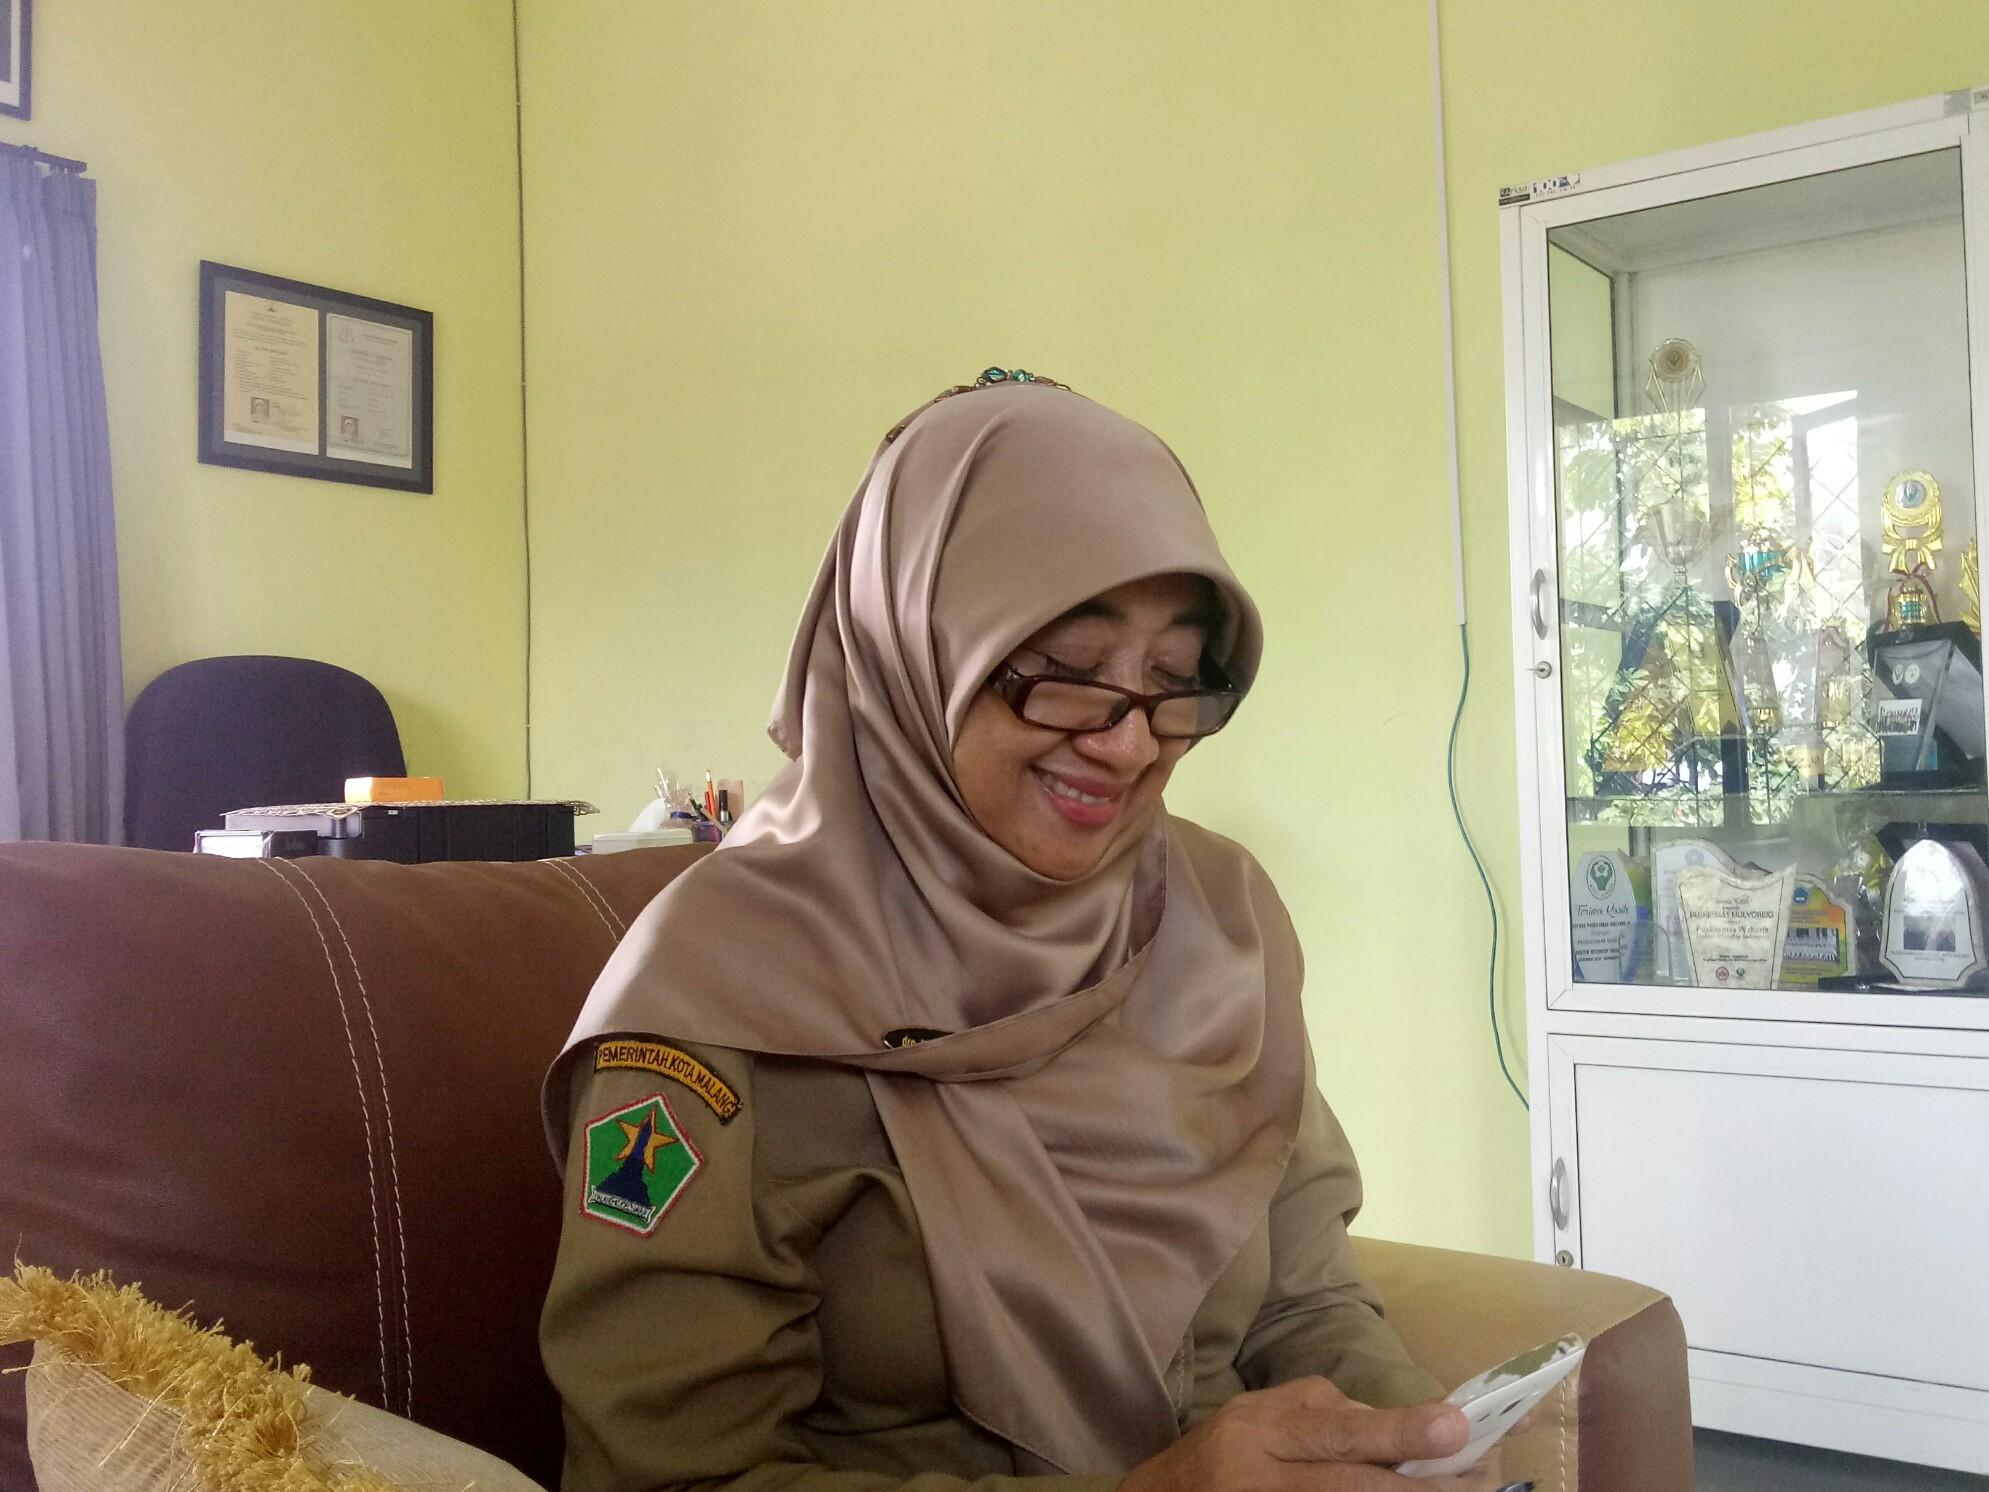 Caption: Kepala Puskesmas Mulyorejo drg. Indra Ratnasari